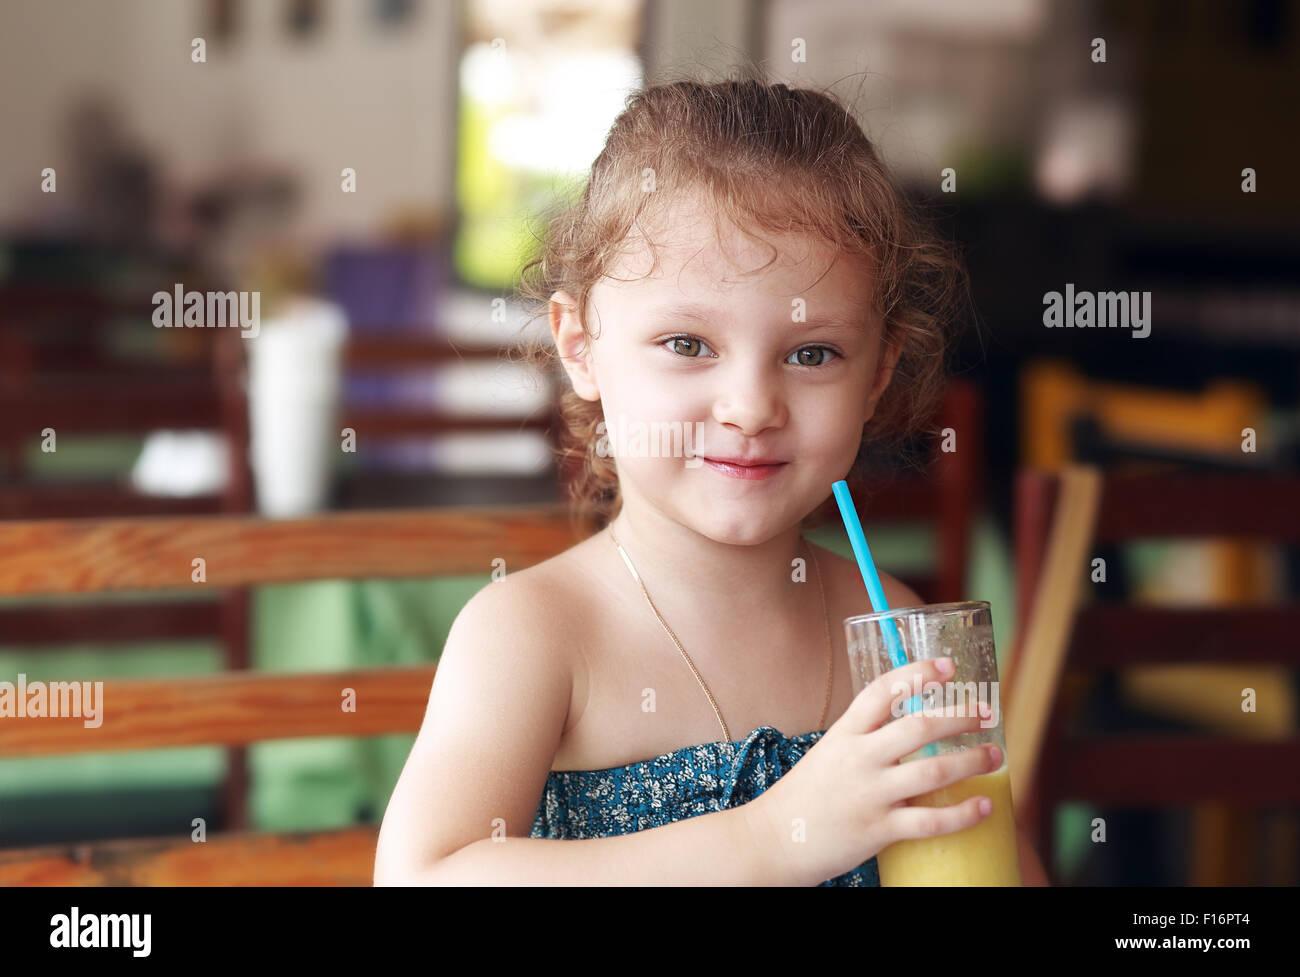 Sorridentes kid menina beber suco fresco de vidro no café Imagens de Stock